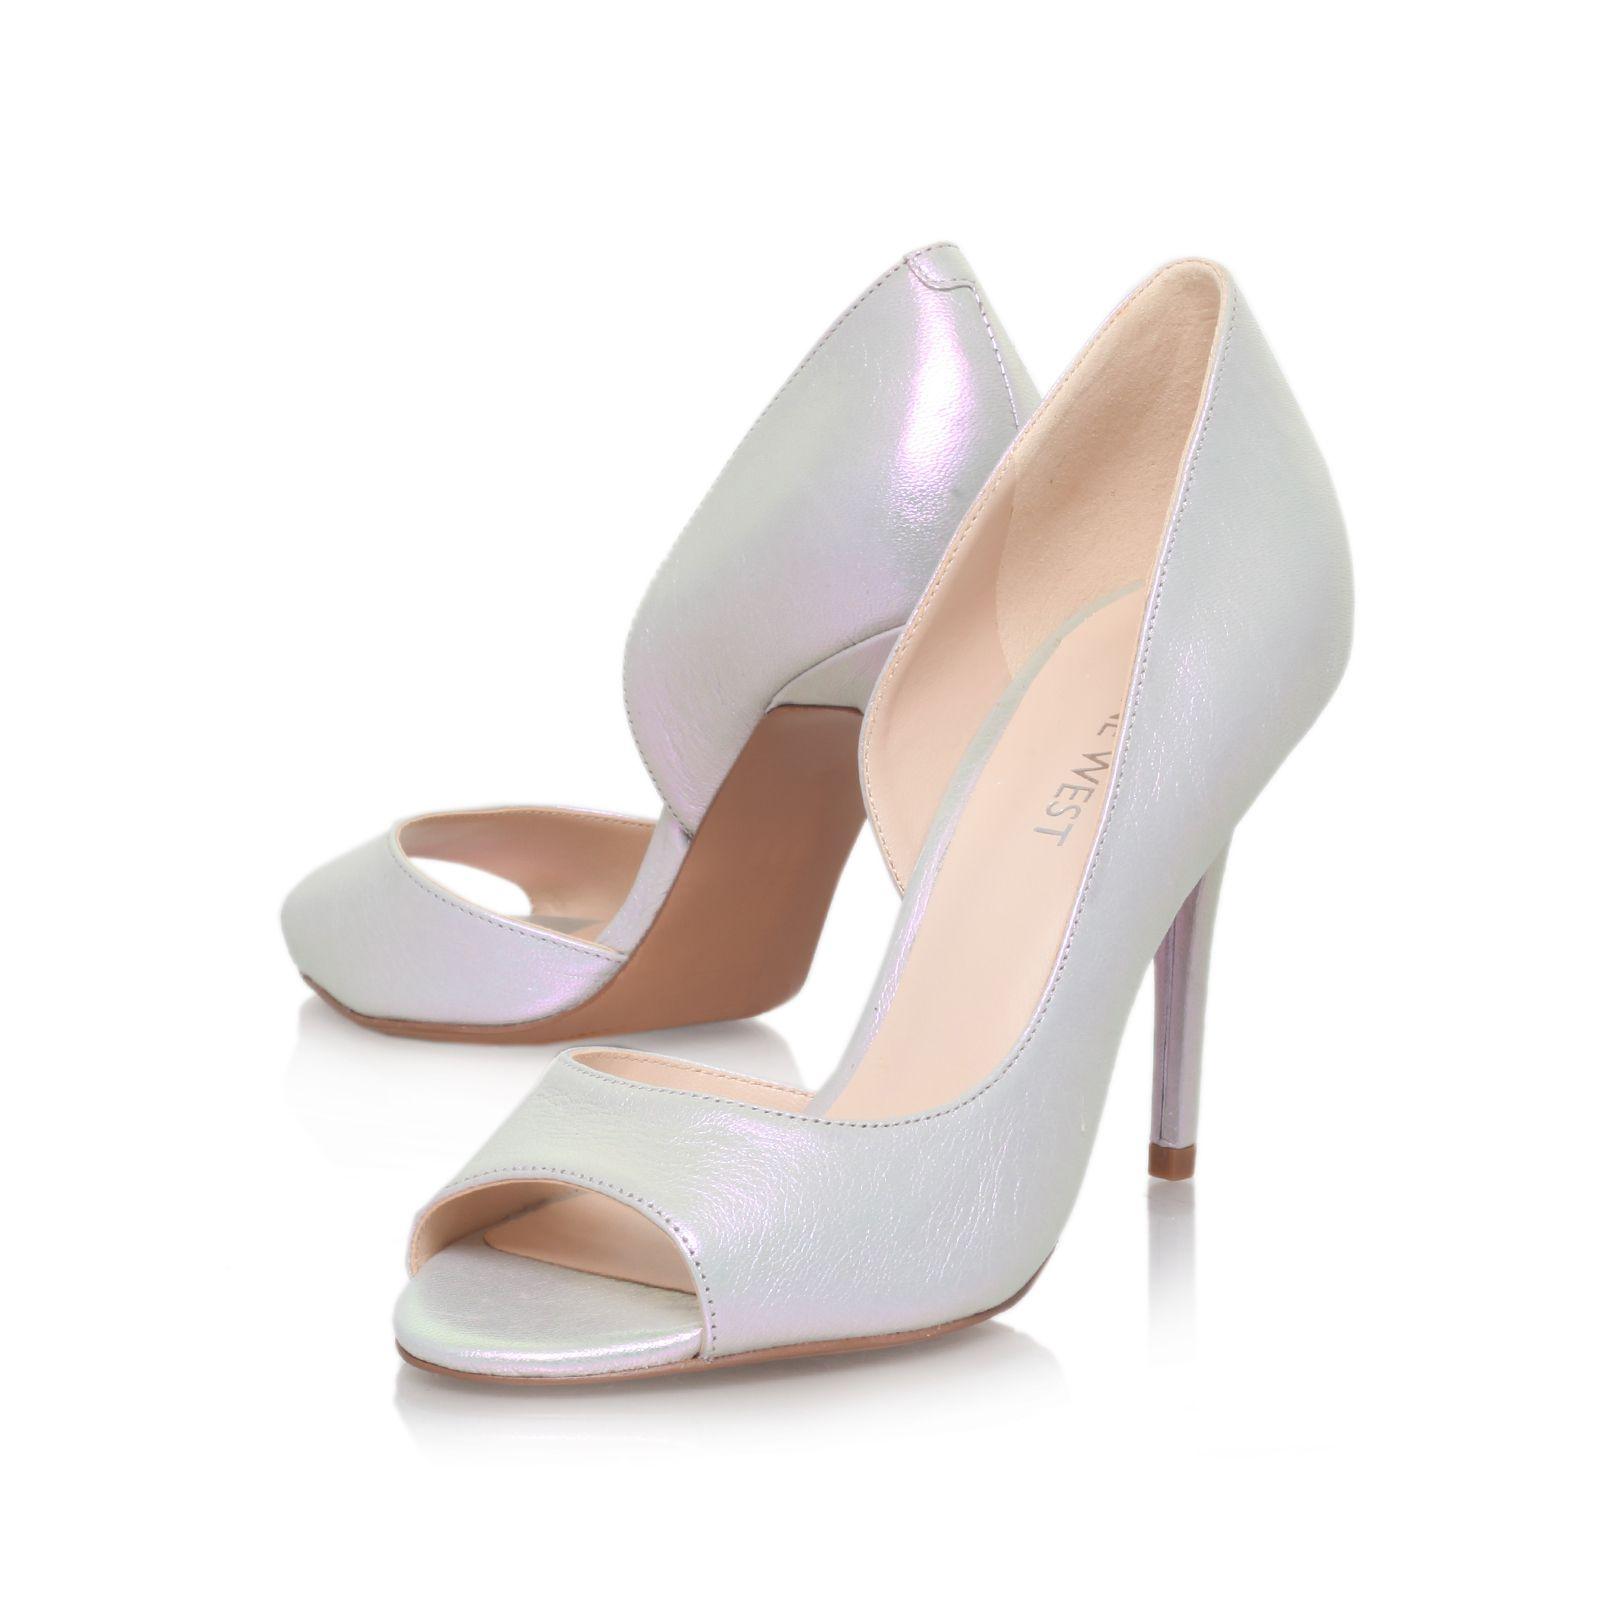 Silver High Heel Peep Toe Shoes